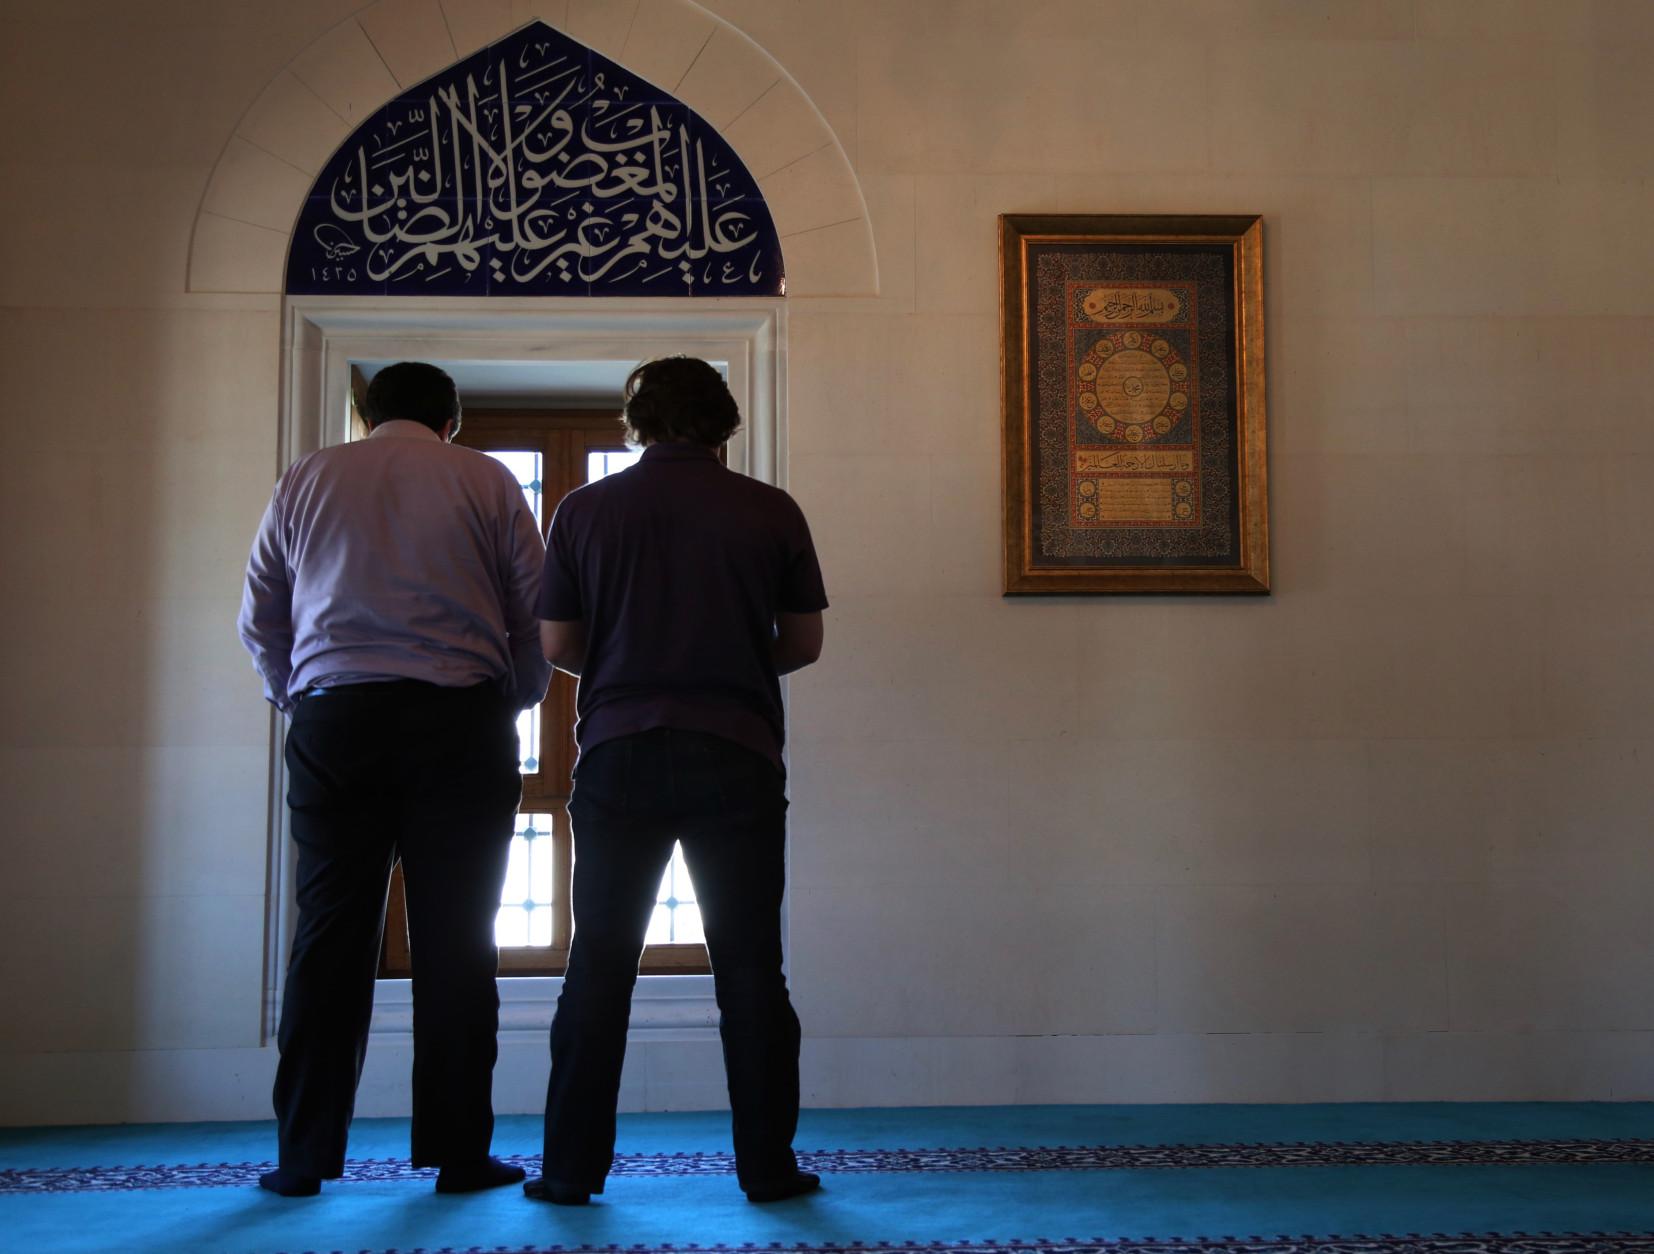 Diab Mustafa, left, and Ibrahim Issa, right, pray the Muslim afternoon prayer, Dhuhr, on Friday, April 1, 2016 at the Diyanet Center of America in Lanham, ...